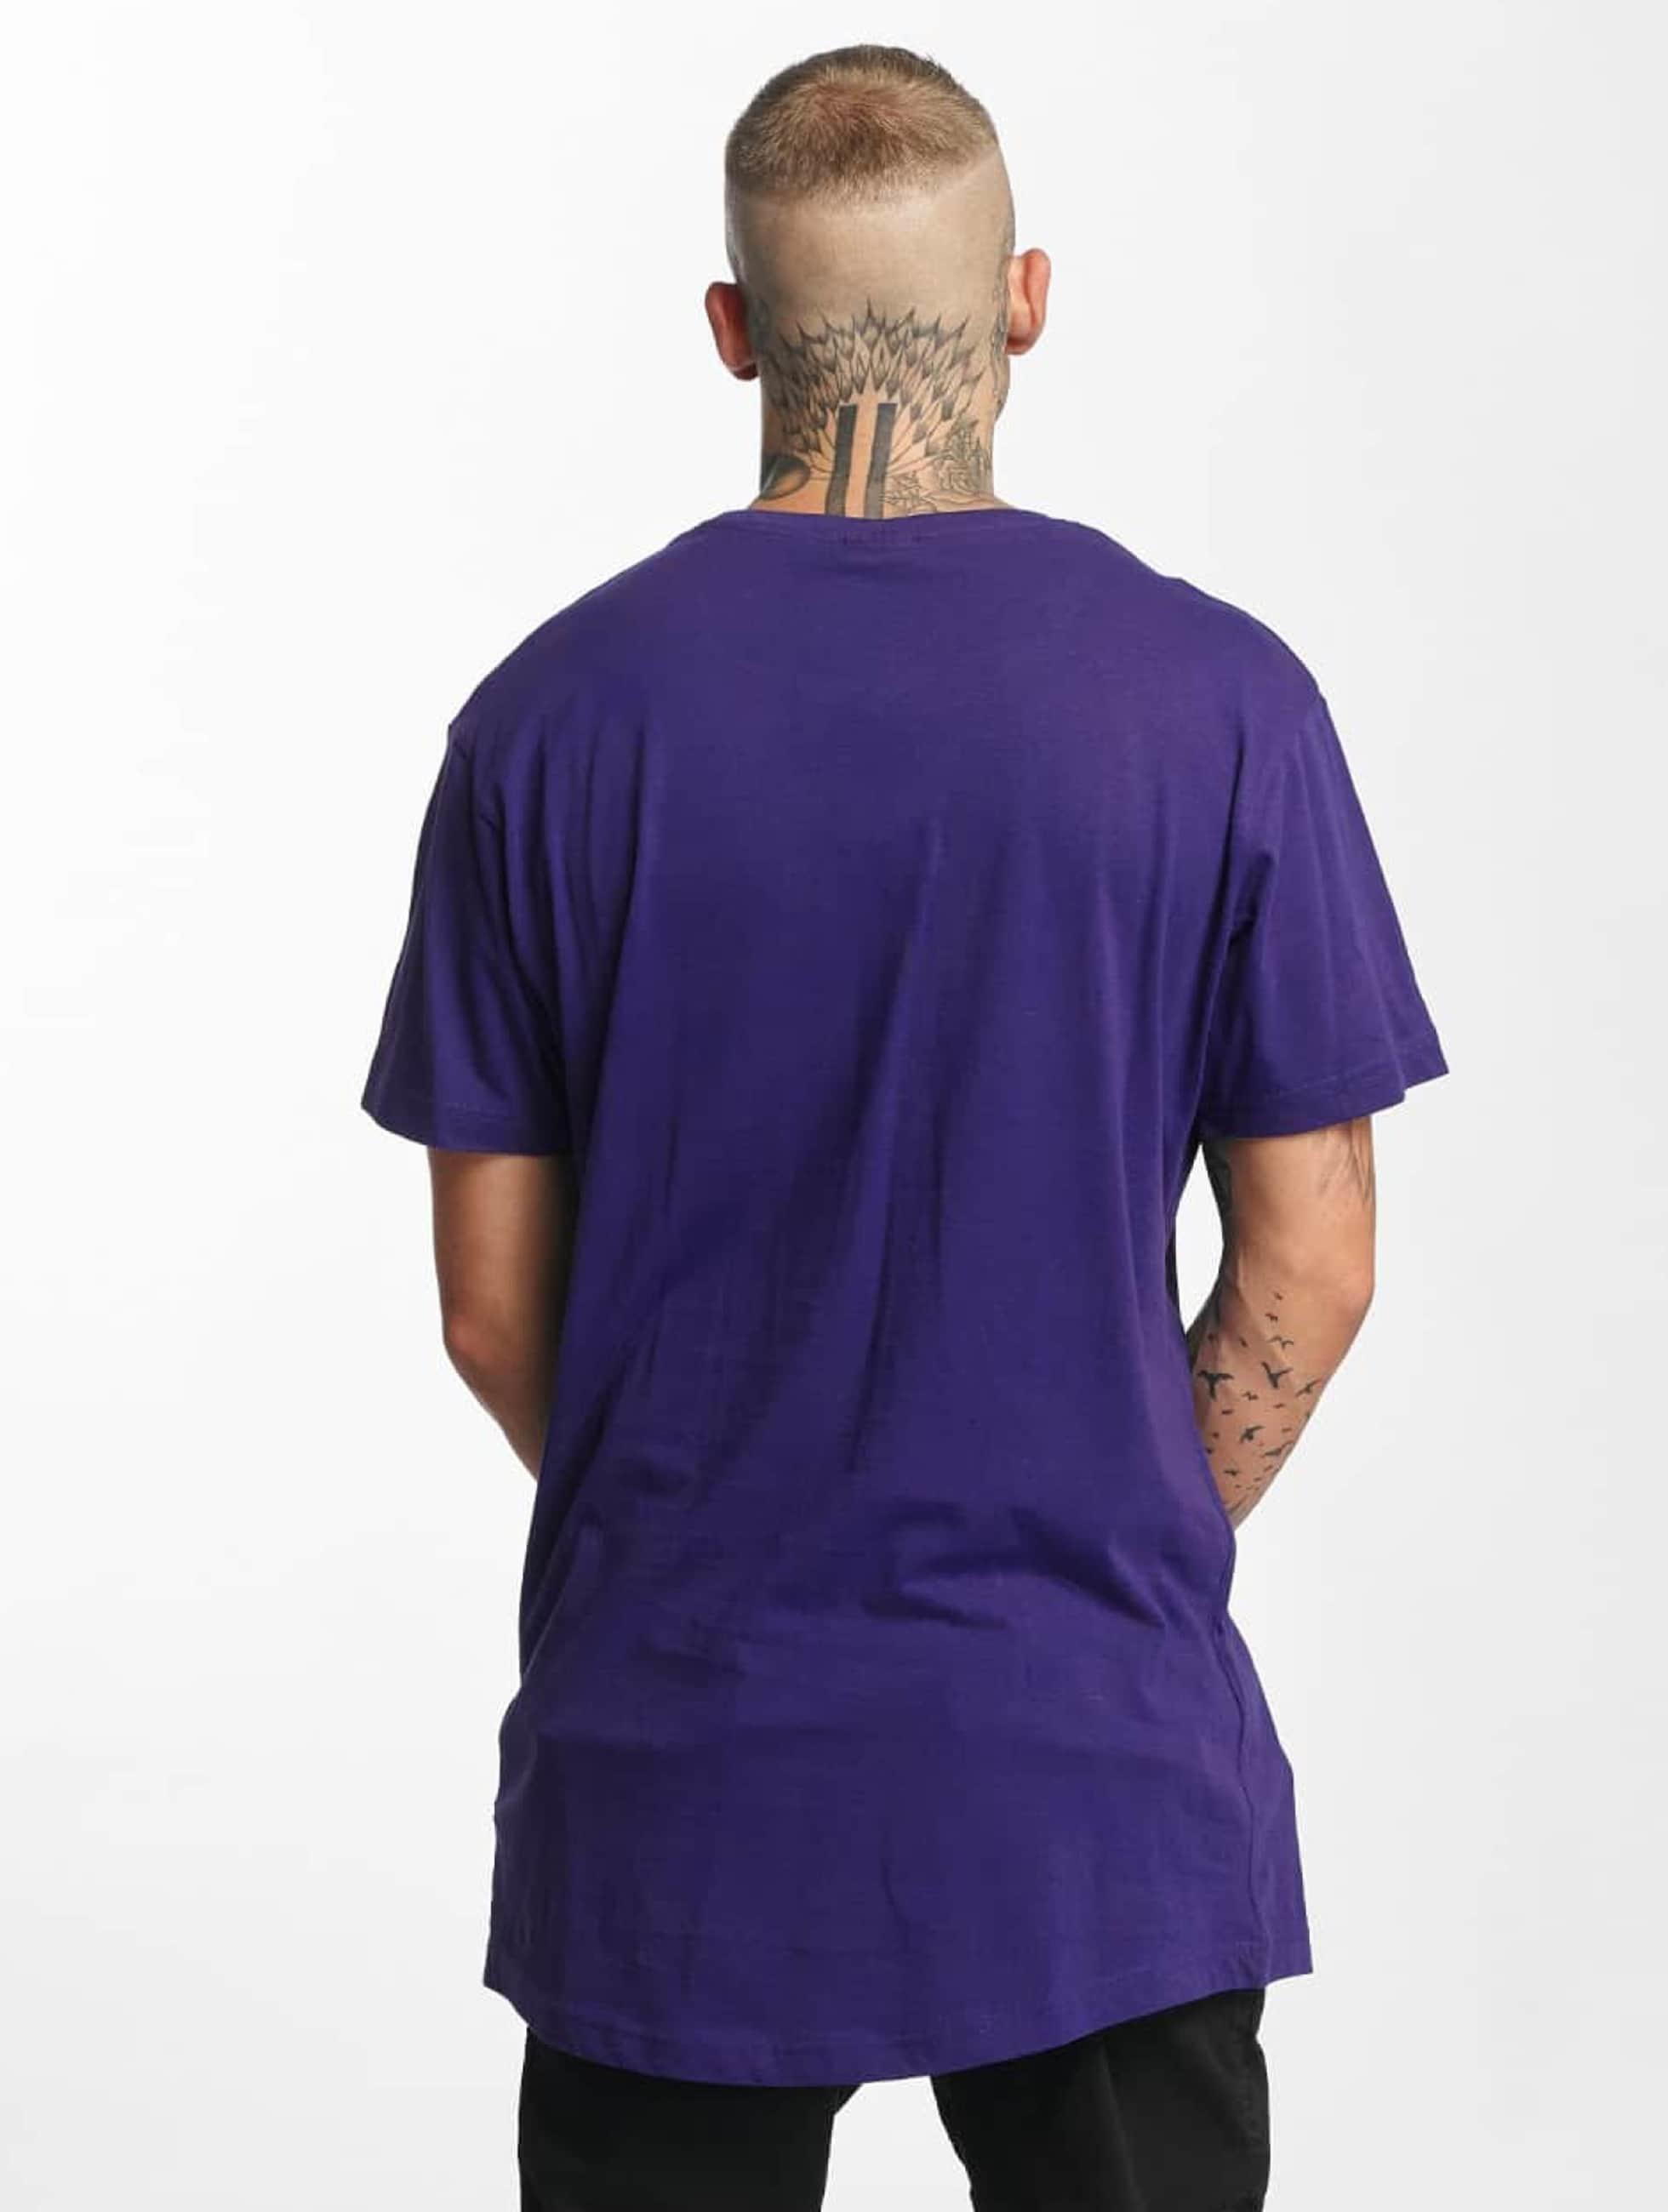 Urban Classics Tall Tees Shaped Oversized Long пурпурный